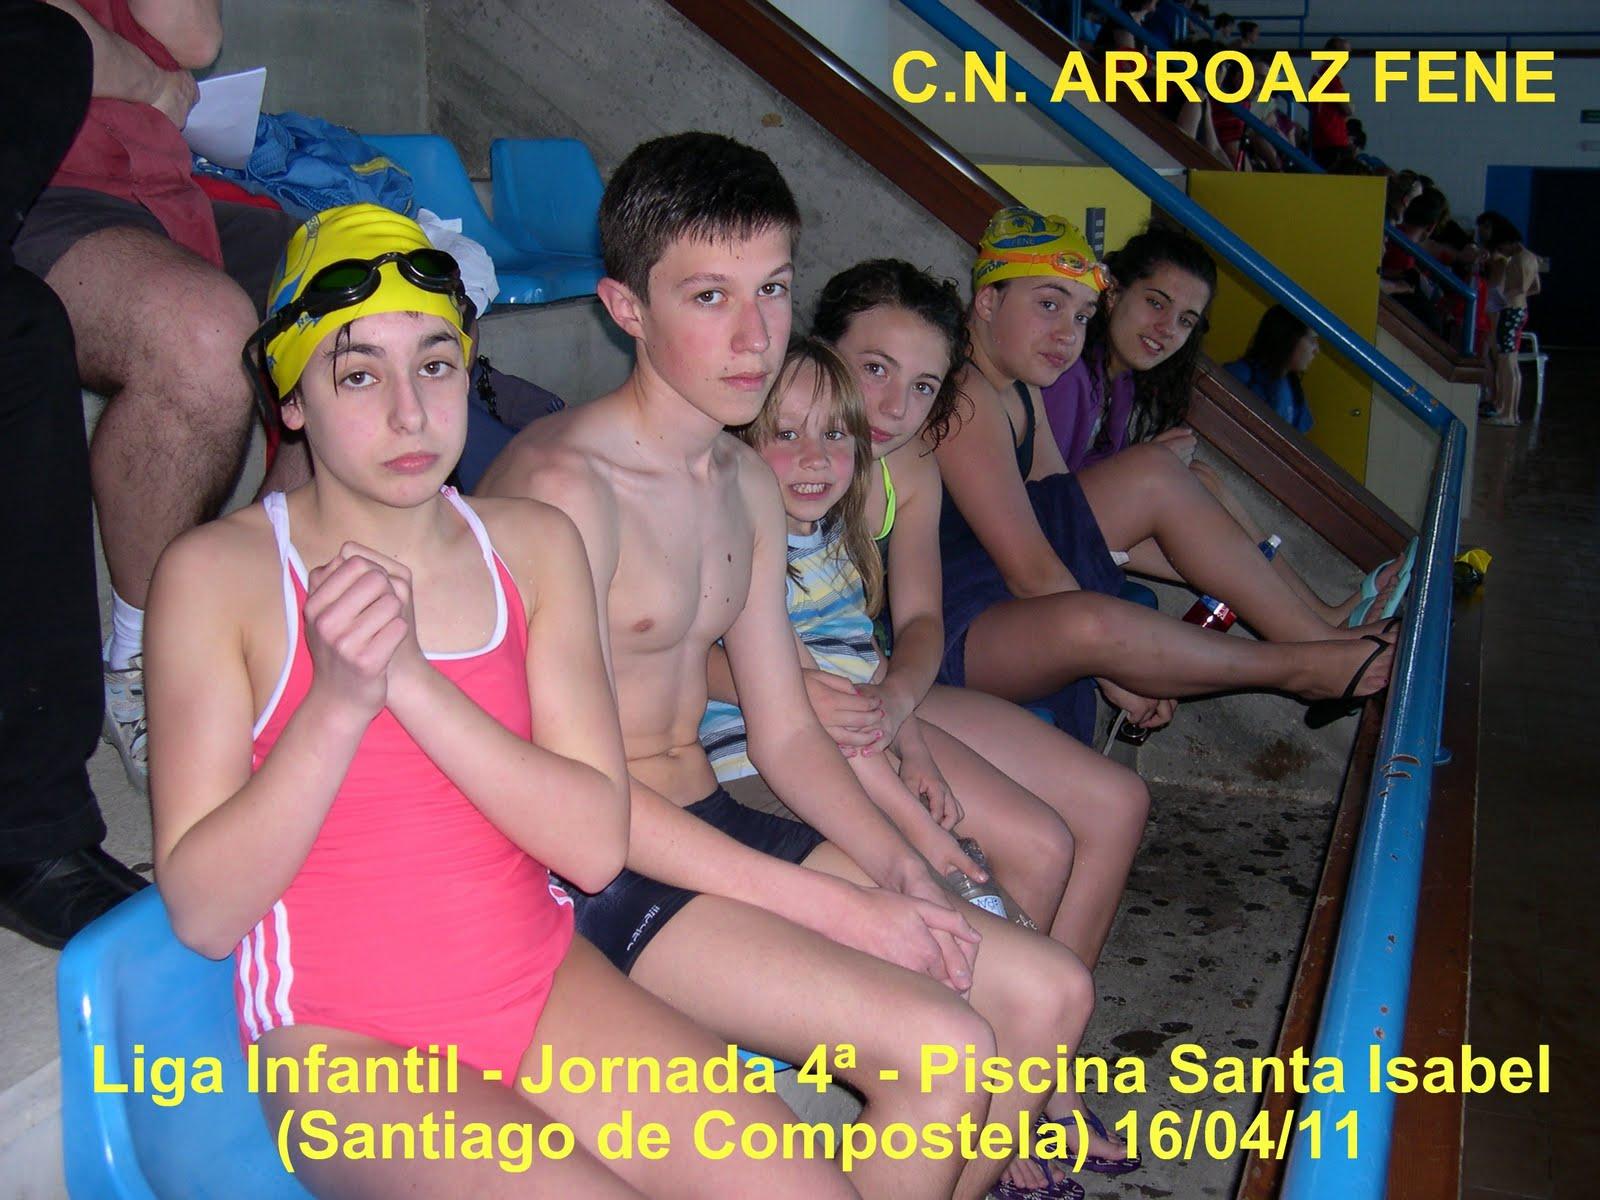 Club nataci n arroaz fene liga infantil jornada 4 for Piscina de naron